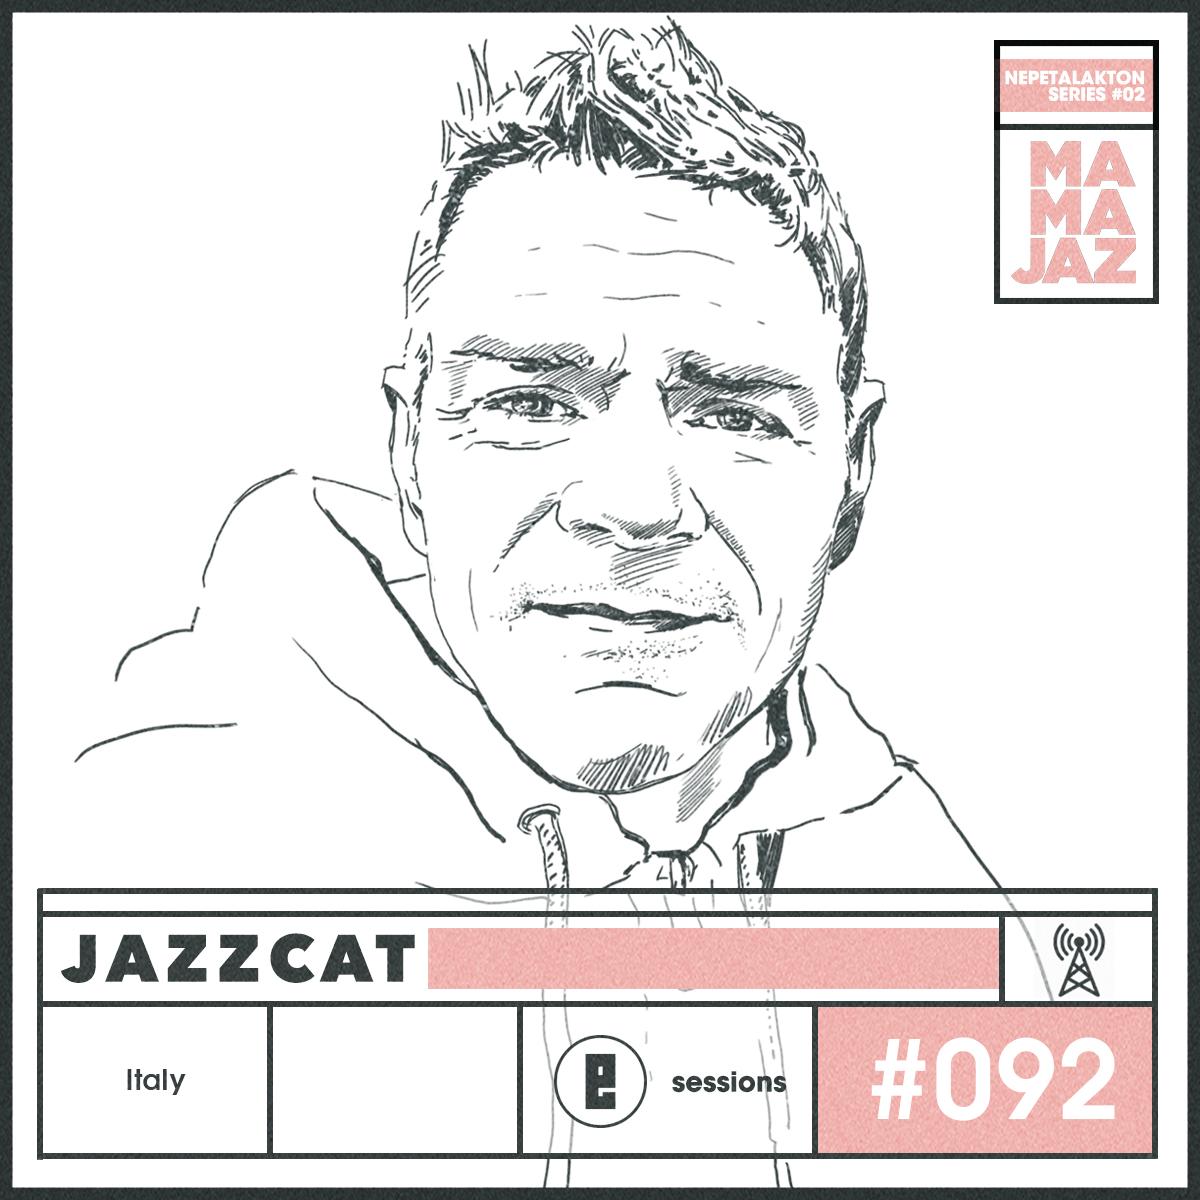 session #092 - Jazzcat